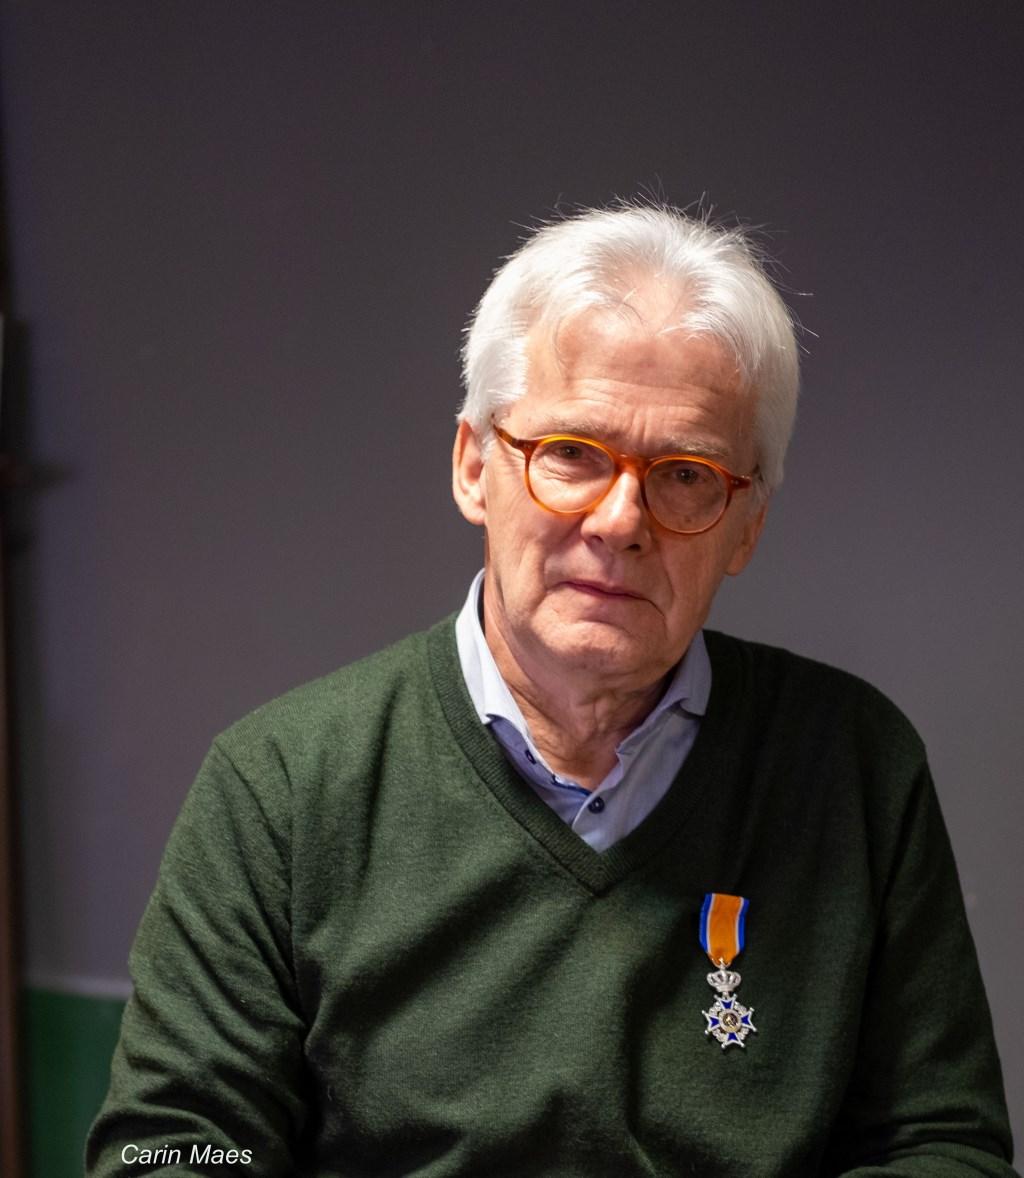 Herman Clevis is lid in de Orde van Oranje-Nassau, foto: Carin Maes Foto: Carin Maes © grenskoerier